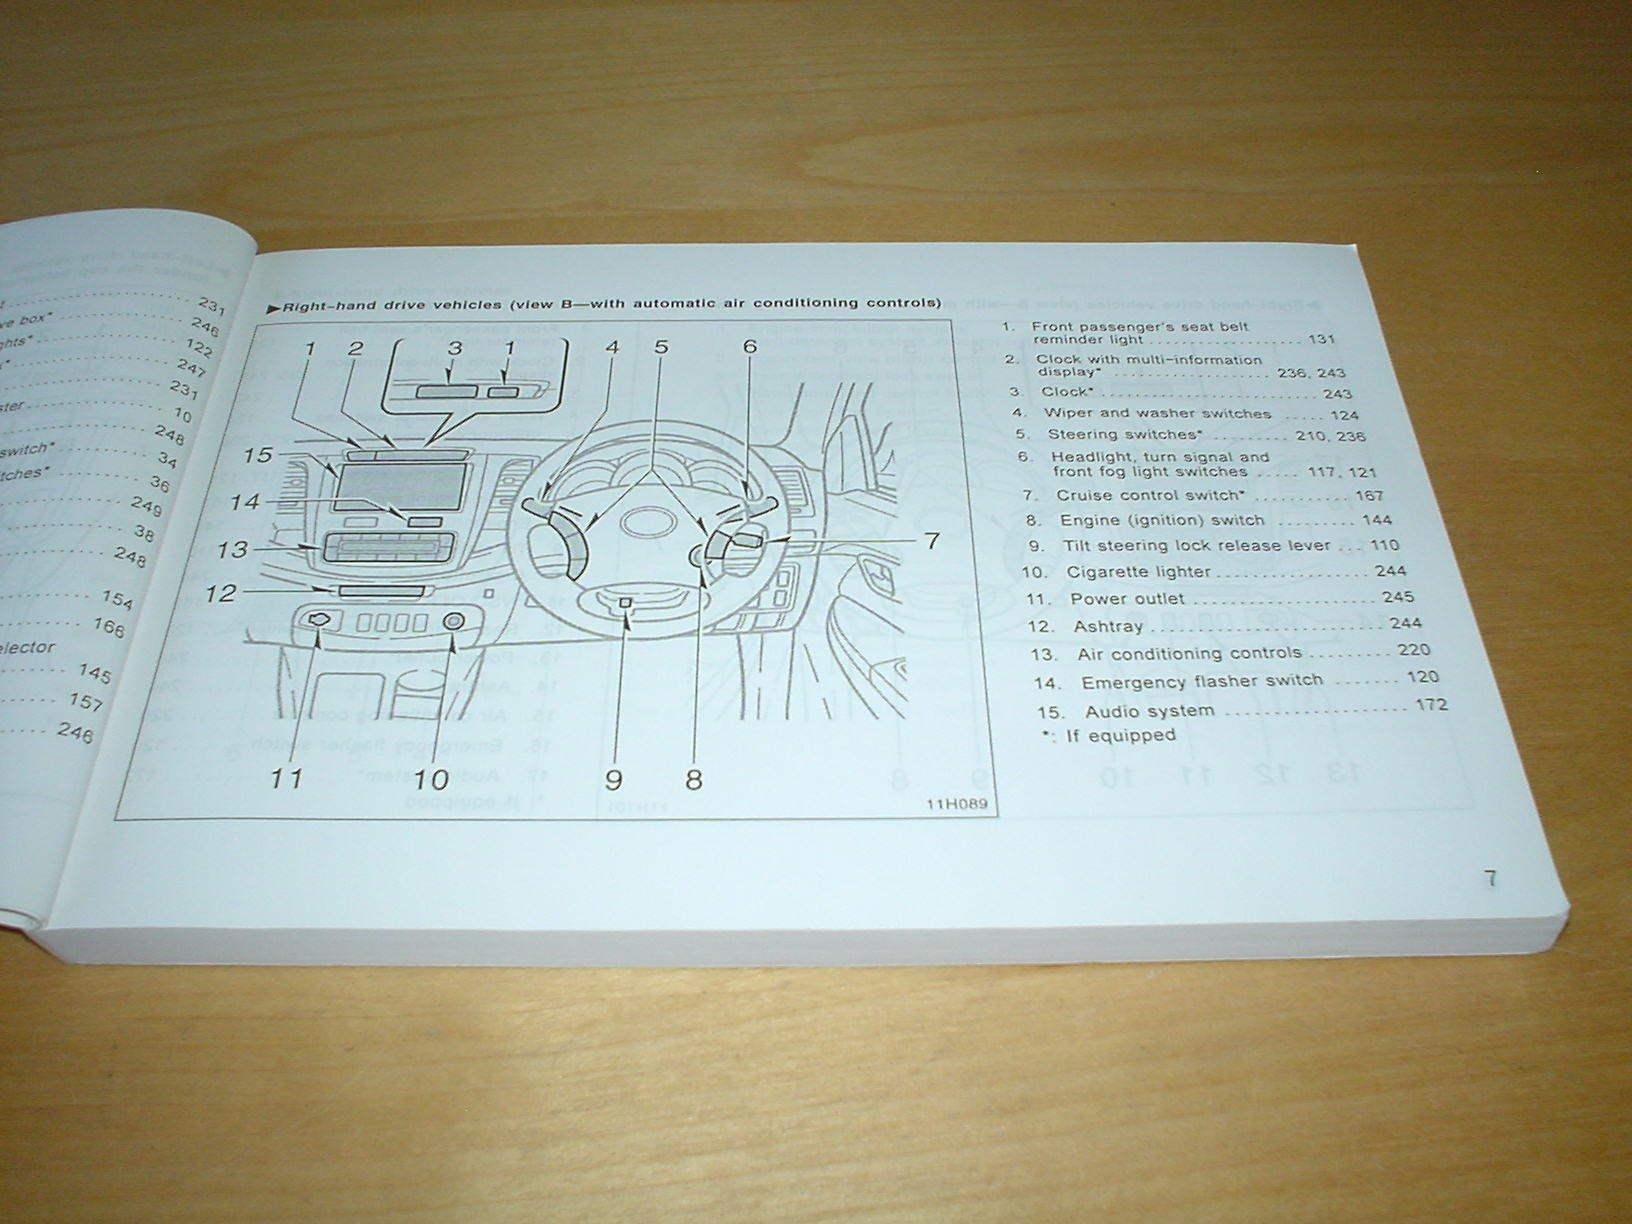 TOYOTA HILUX OWNERS MANUAL HANDBOOK - 1GR-FE 4.0 / 1TR-FE 2.0 / 2TR-FE 2.7  / 1KD-FTV 3.0 / 2KD-FTV 2.5 / 5L-E 3.0 LITRE ENGINE - OWNER'S HAND BOOK  MANUAL: ...